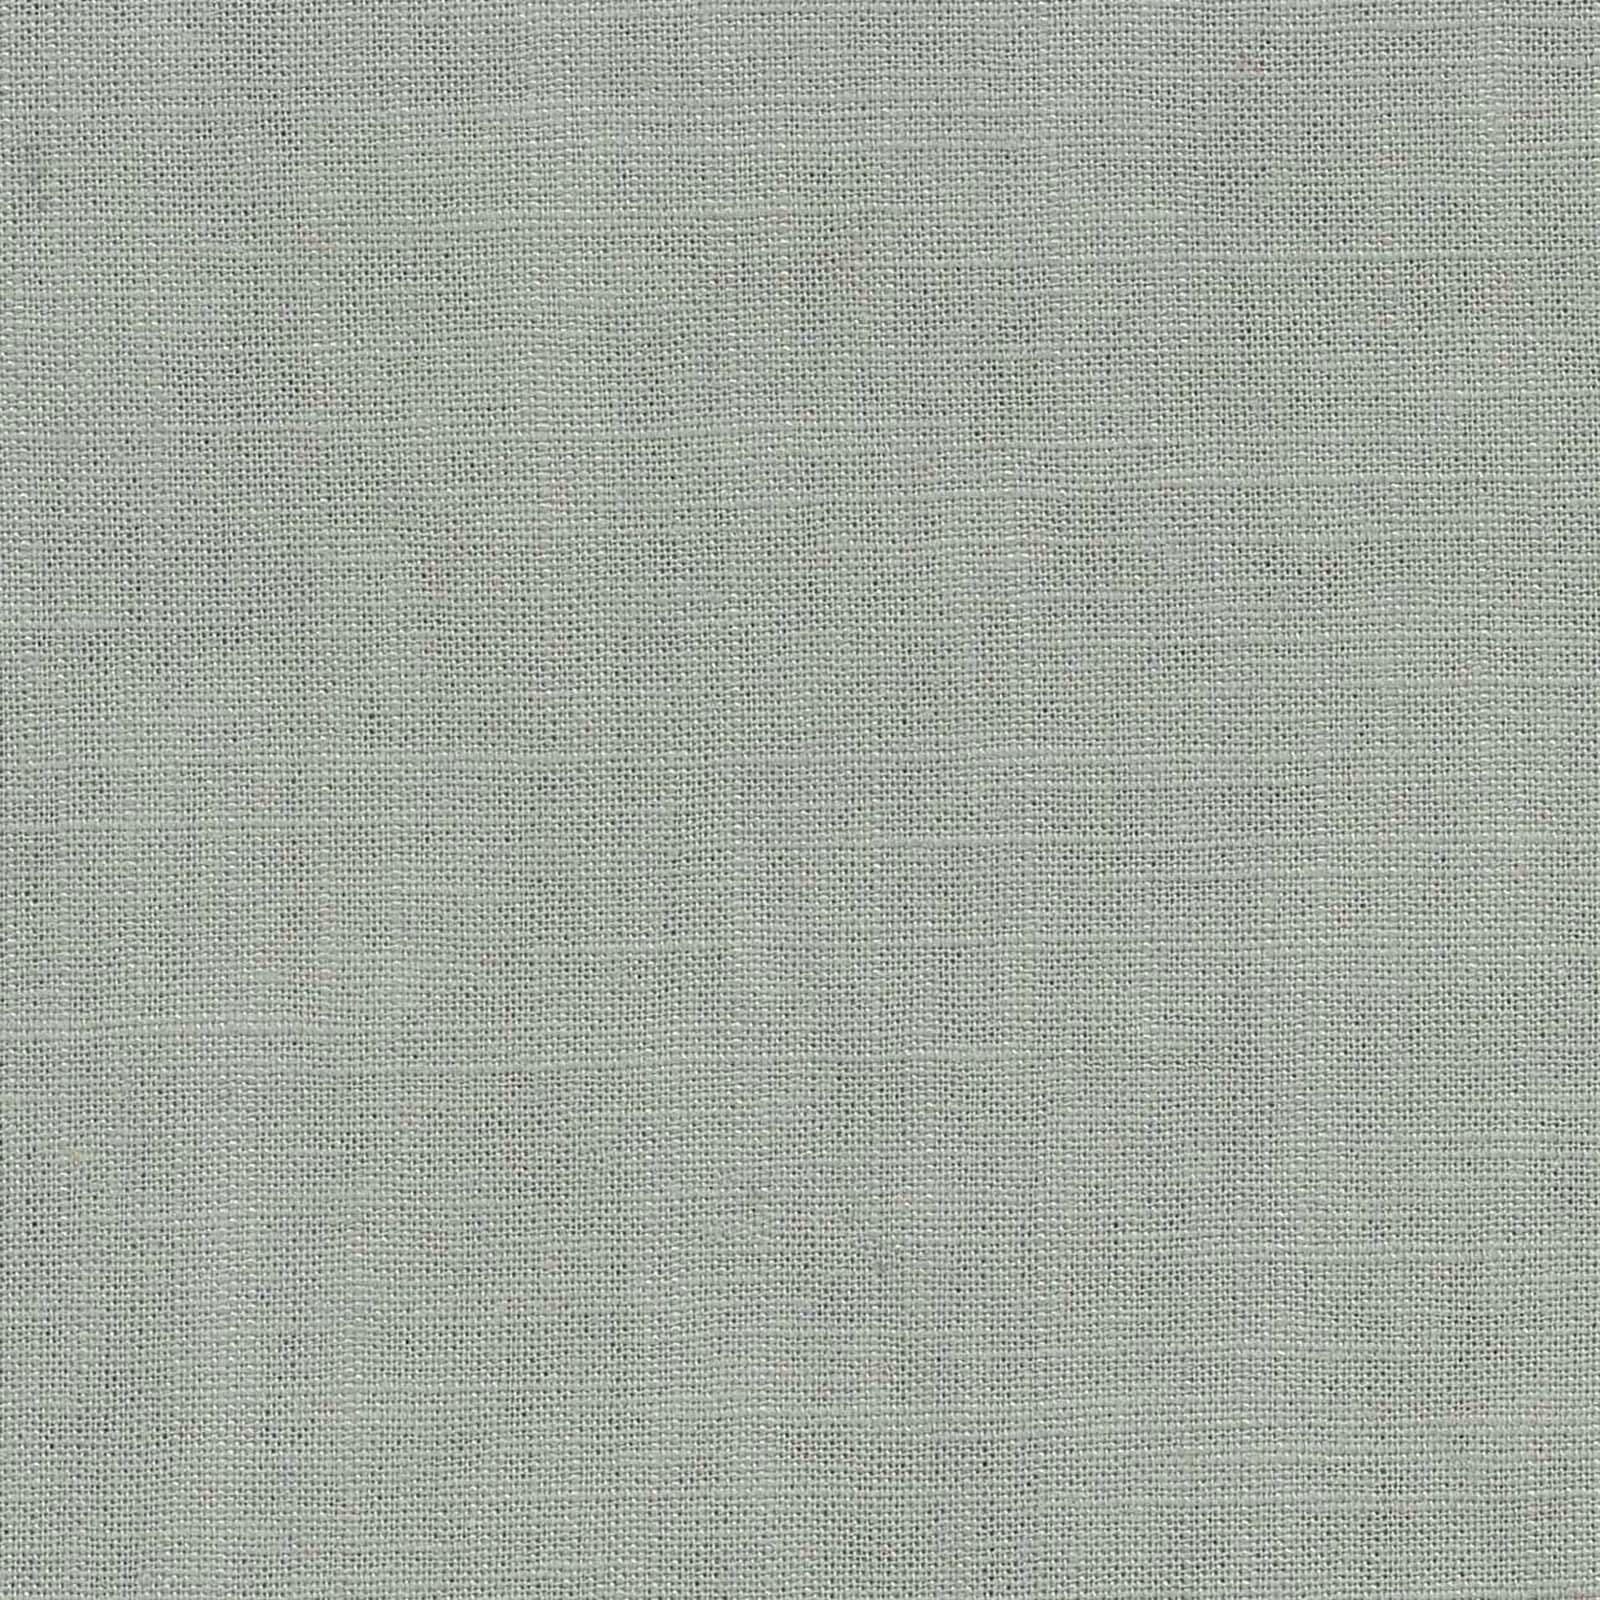 Home Decor Solid Fabric Signature Series Linen Greystone